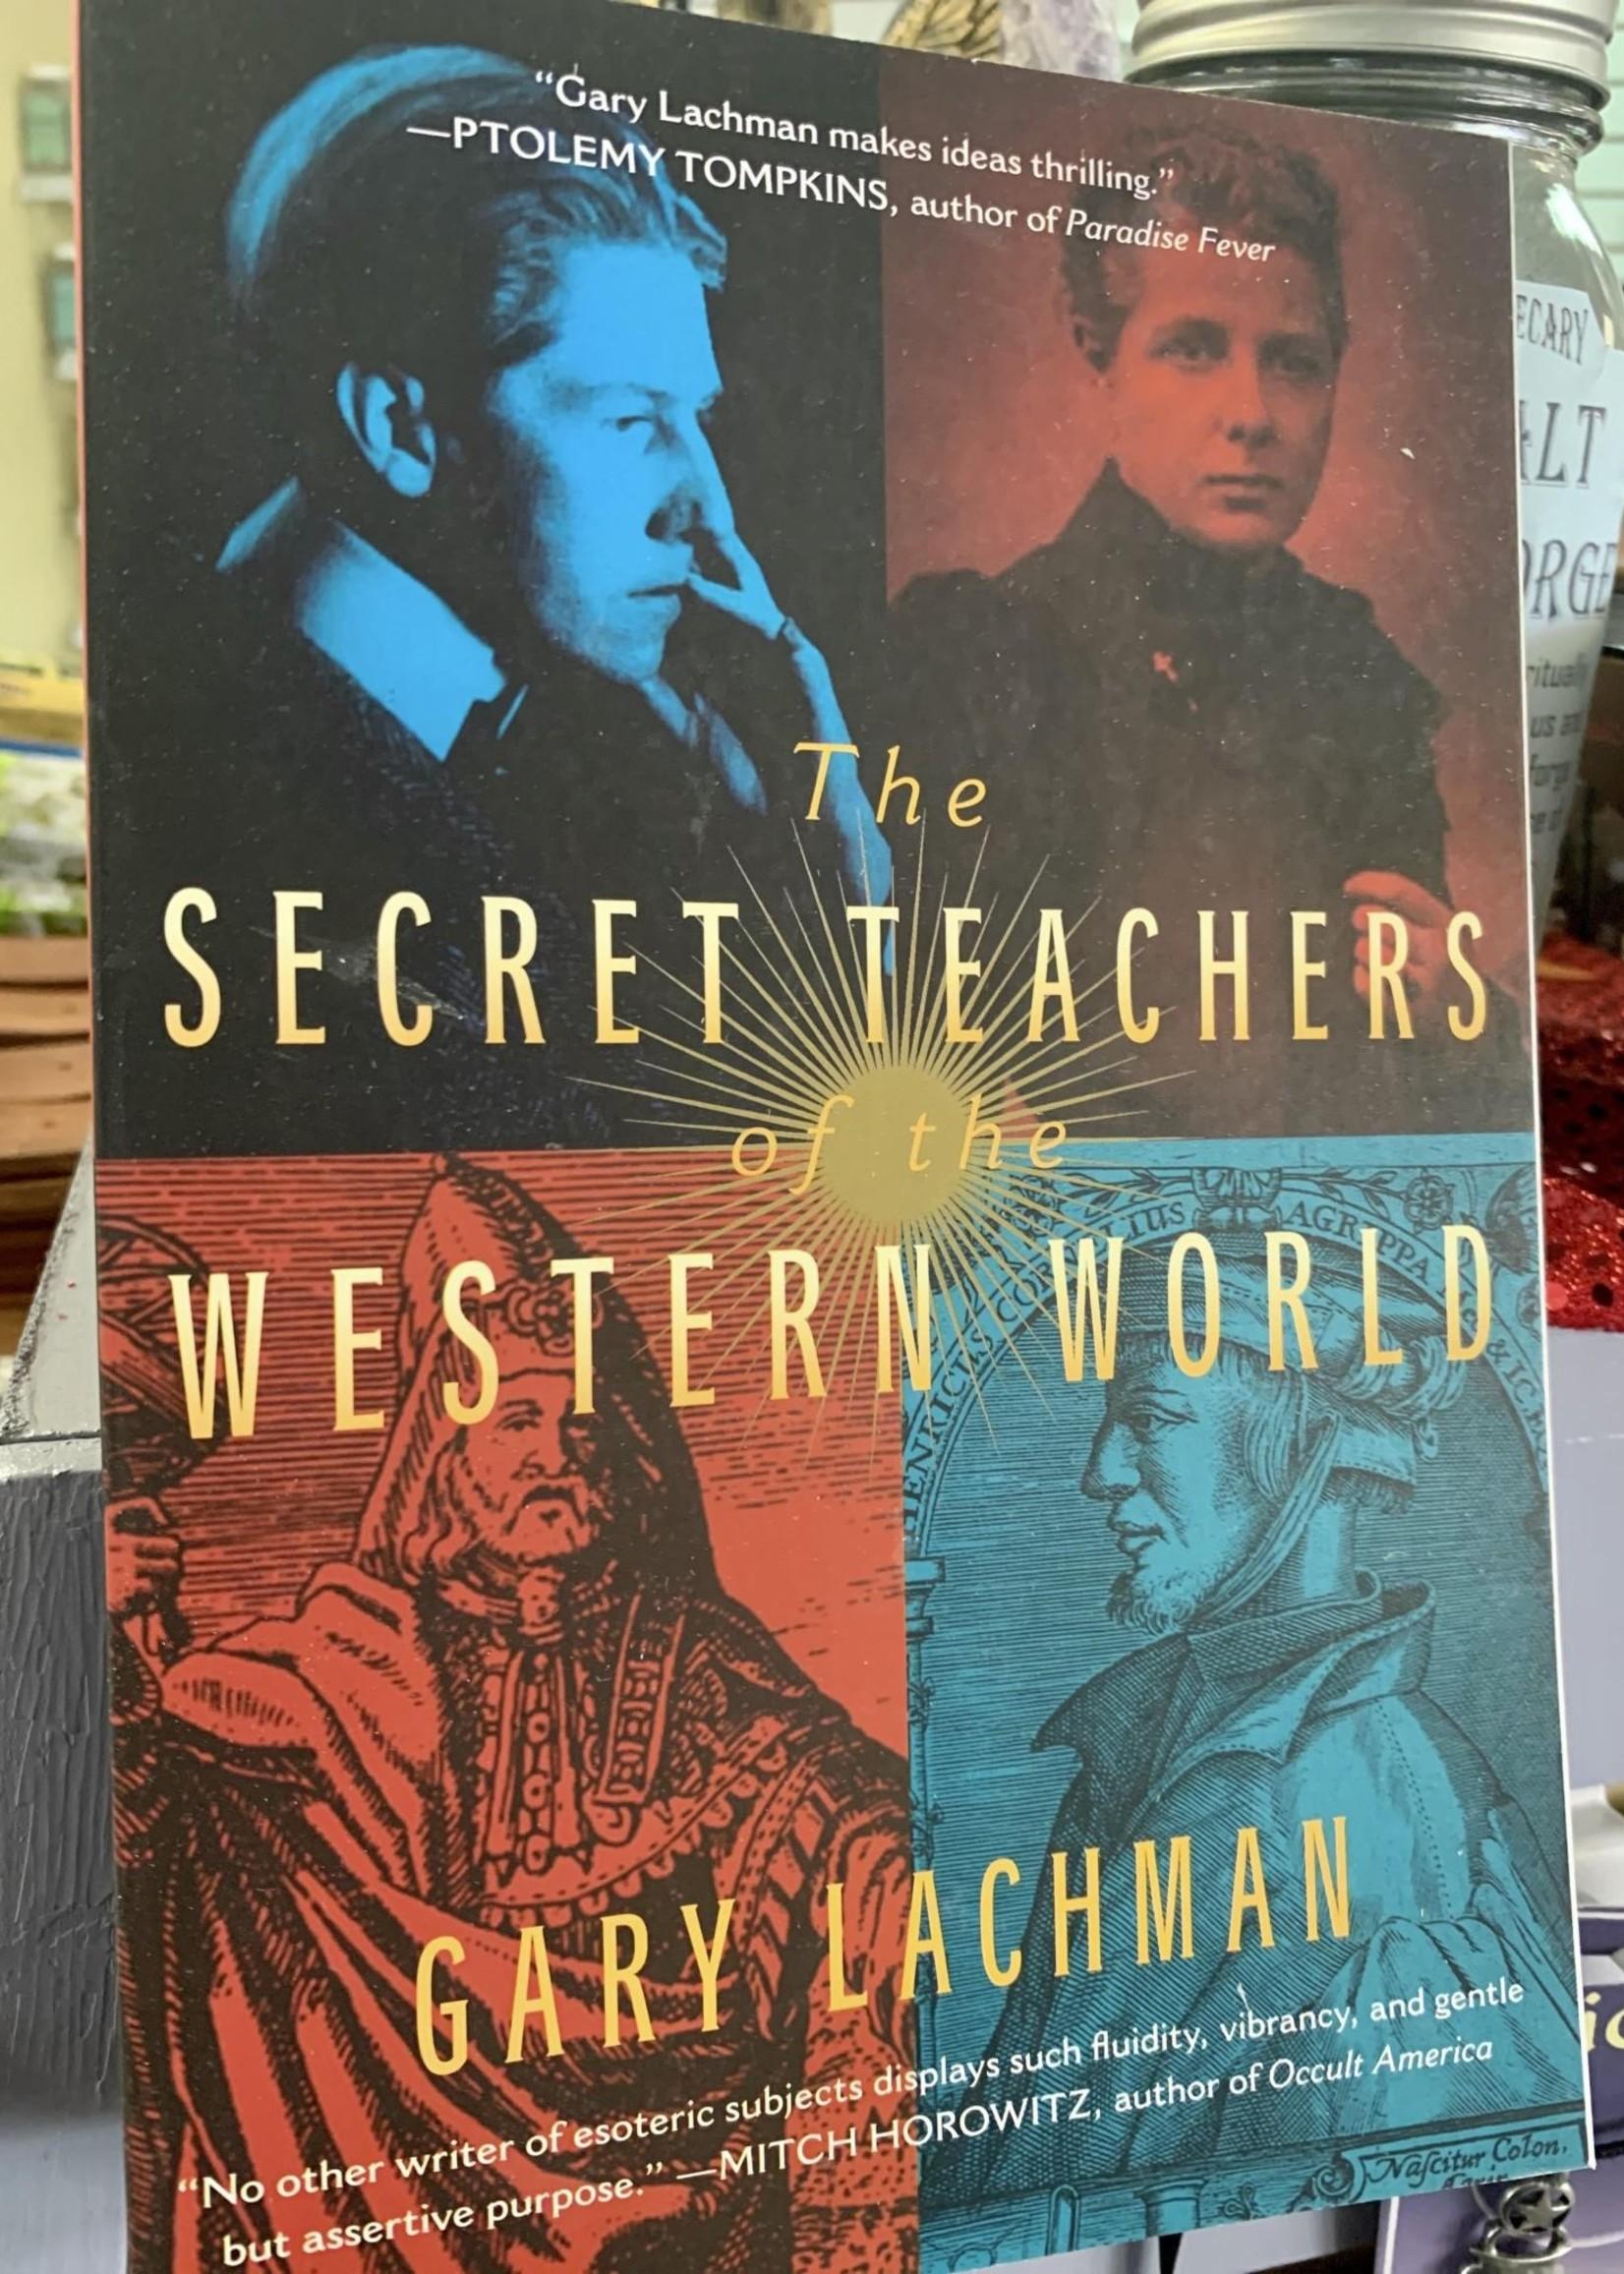 The Secret Teachers of the Western World - By Gary Lachman